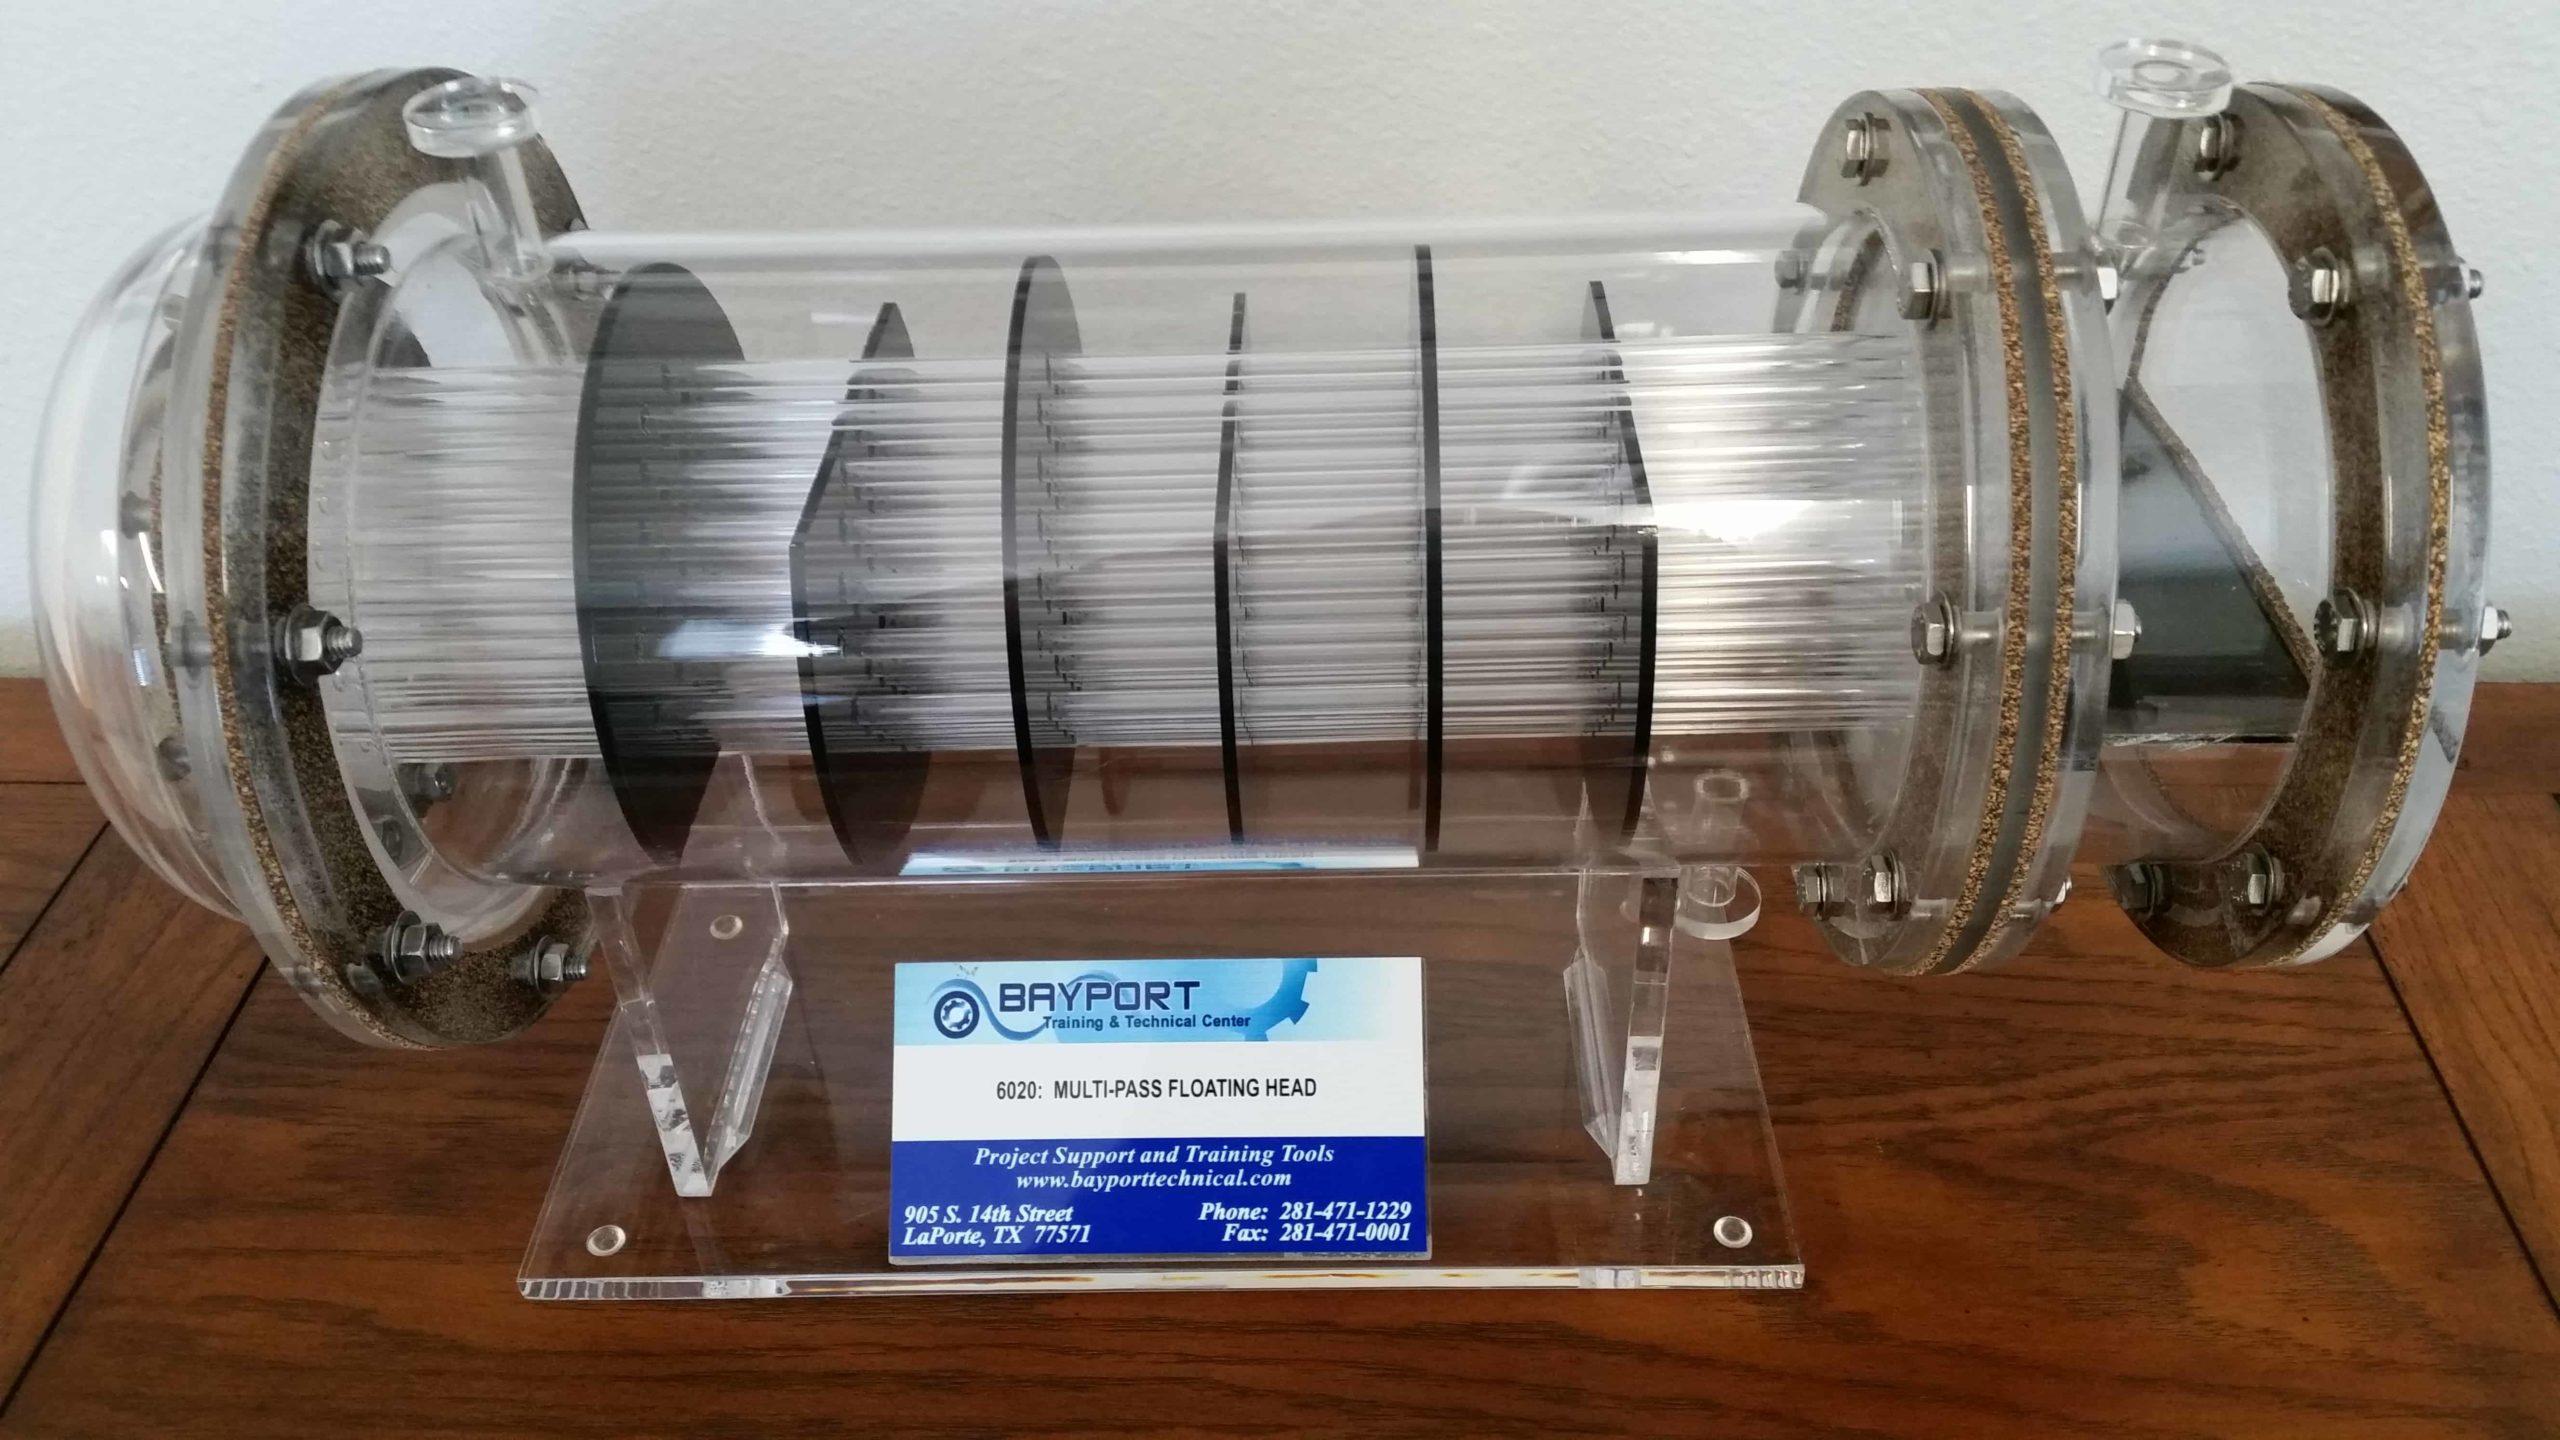 Bayport Technical | Multi-Pass Floating Head Model - Acrylic